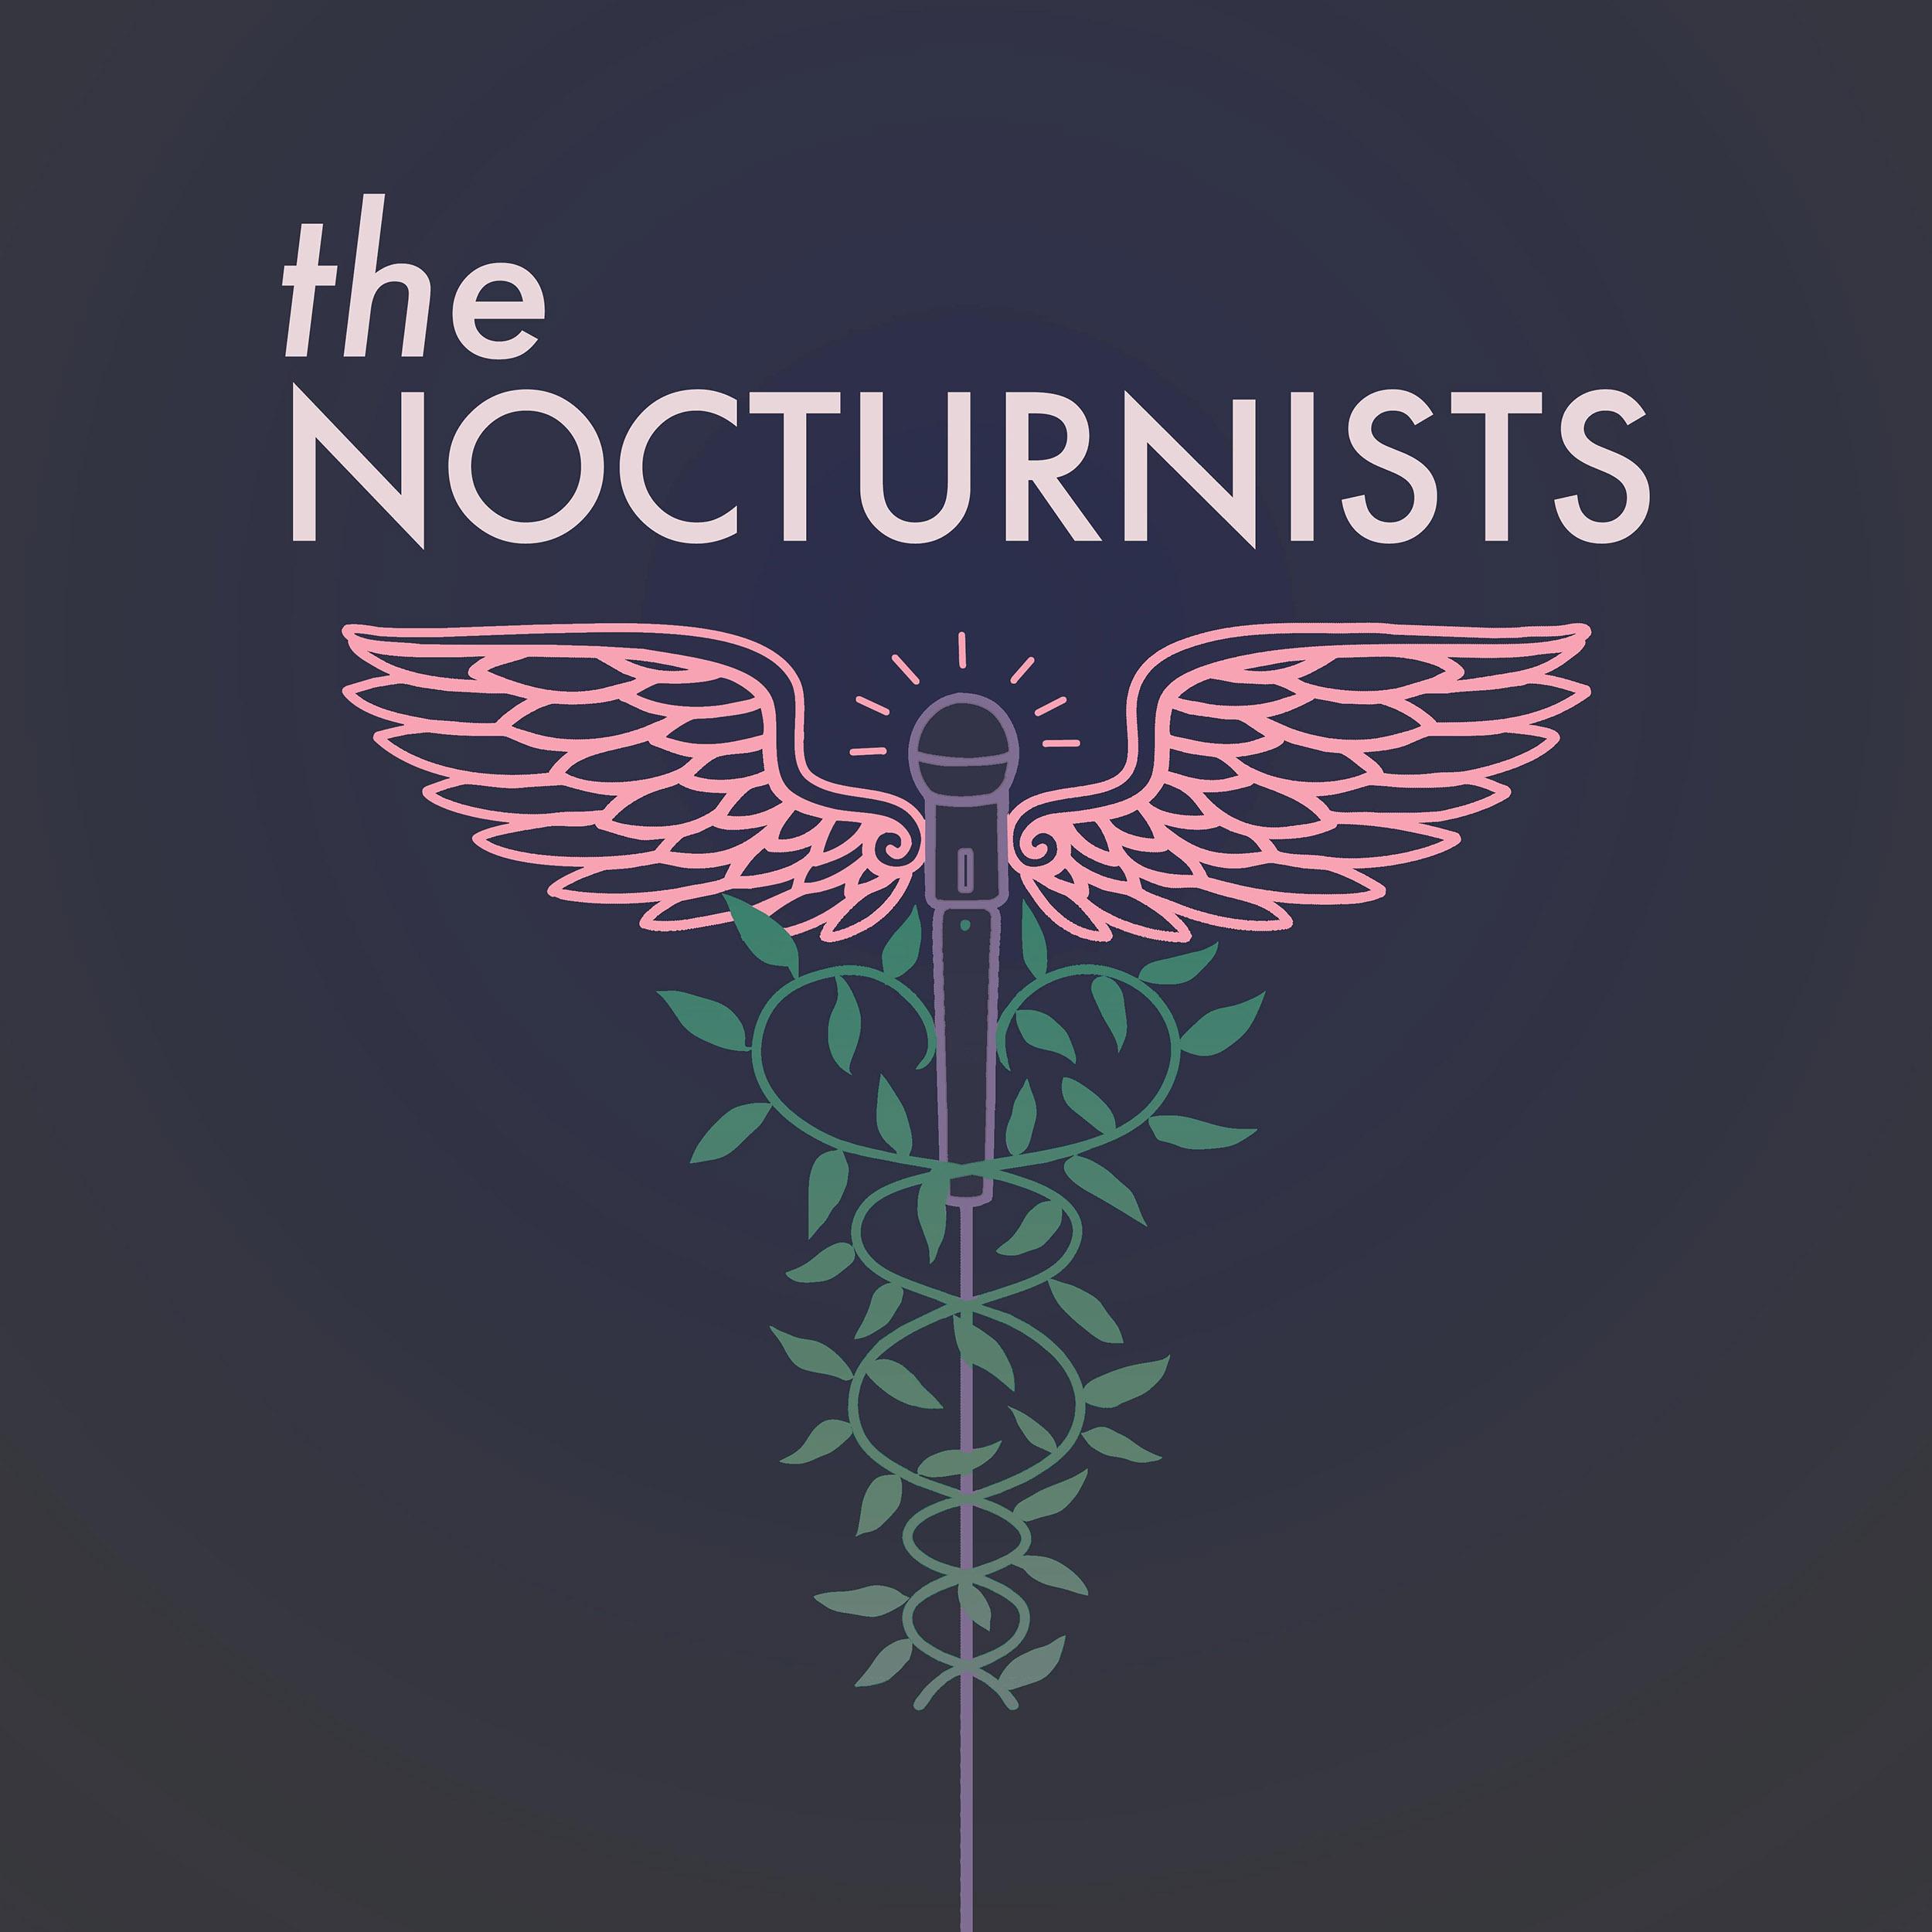 Caption: The Nocturnists, Credit: Lindsay Mound